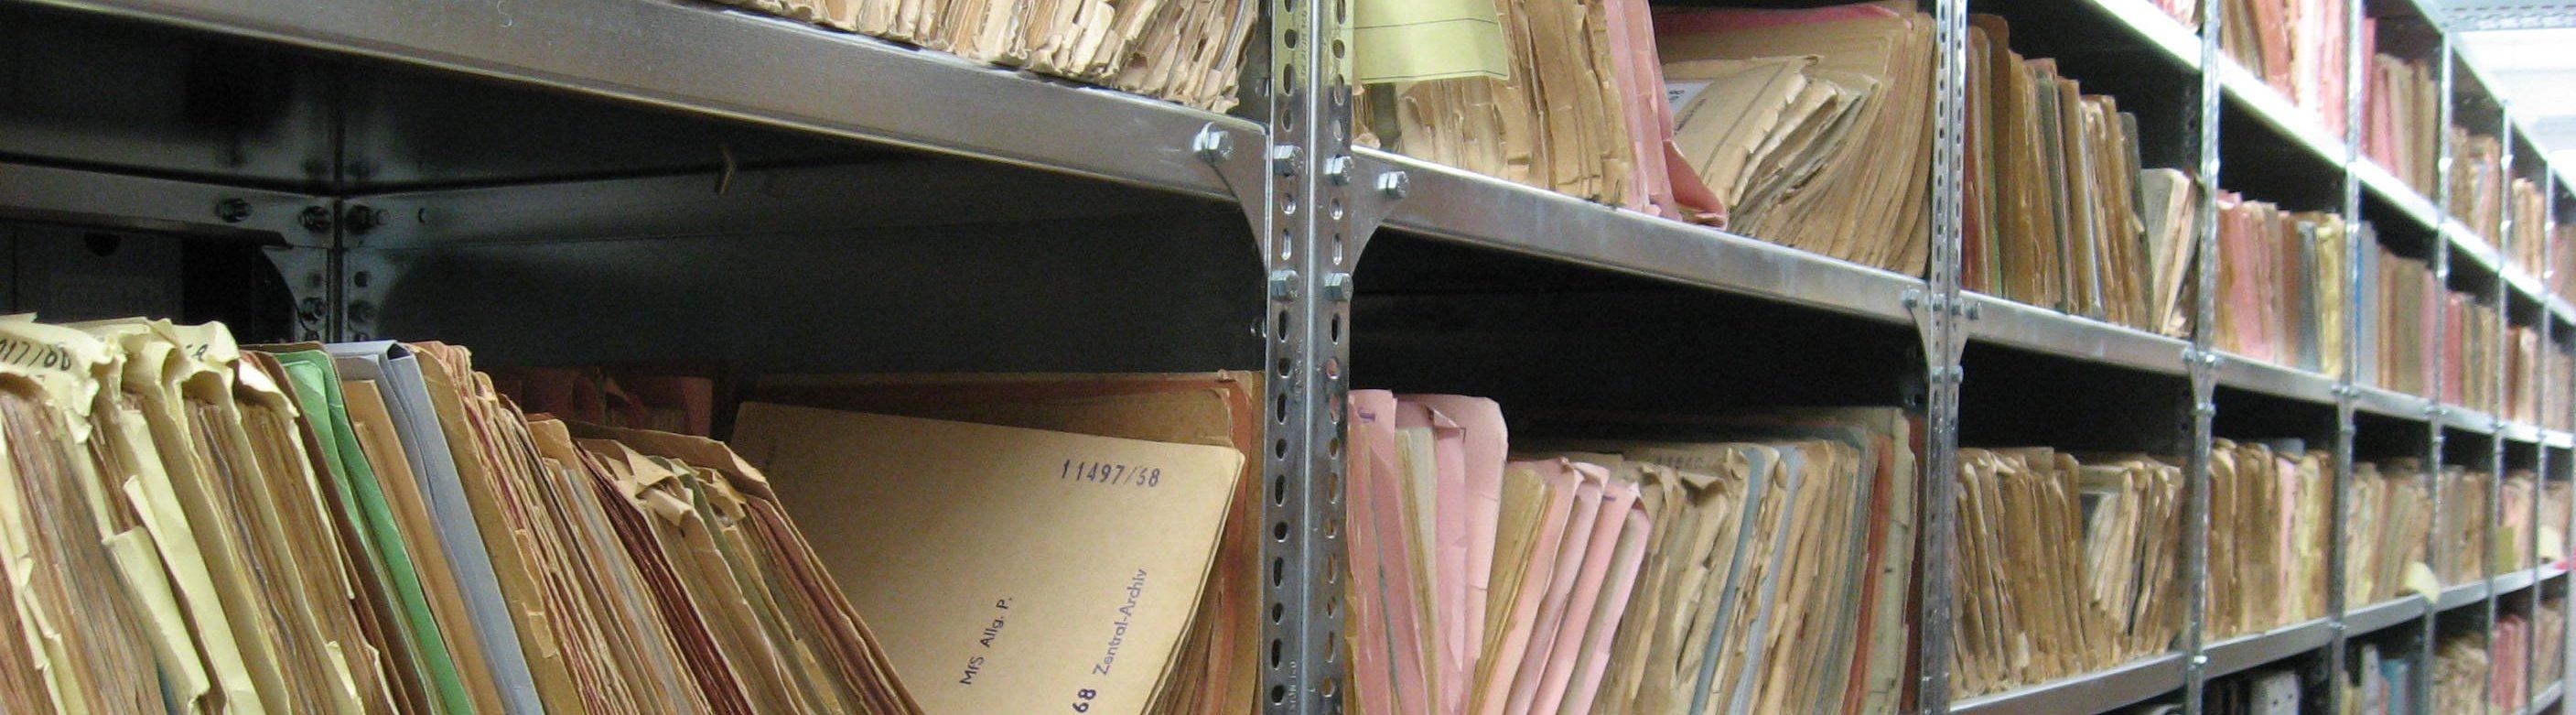 files-1633406